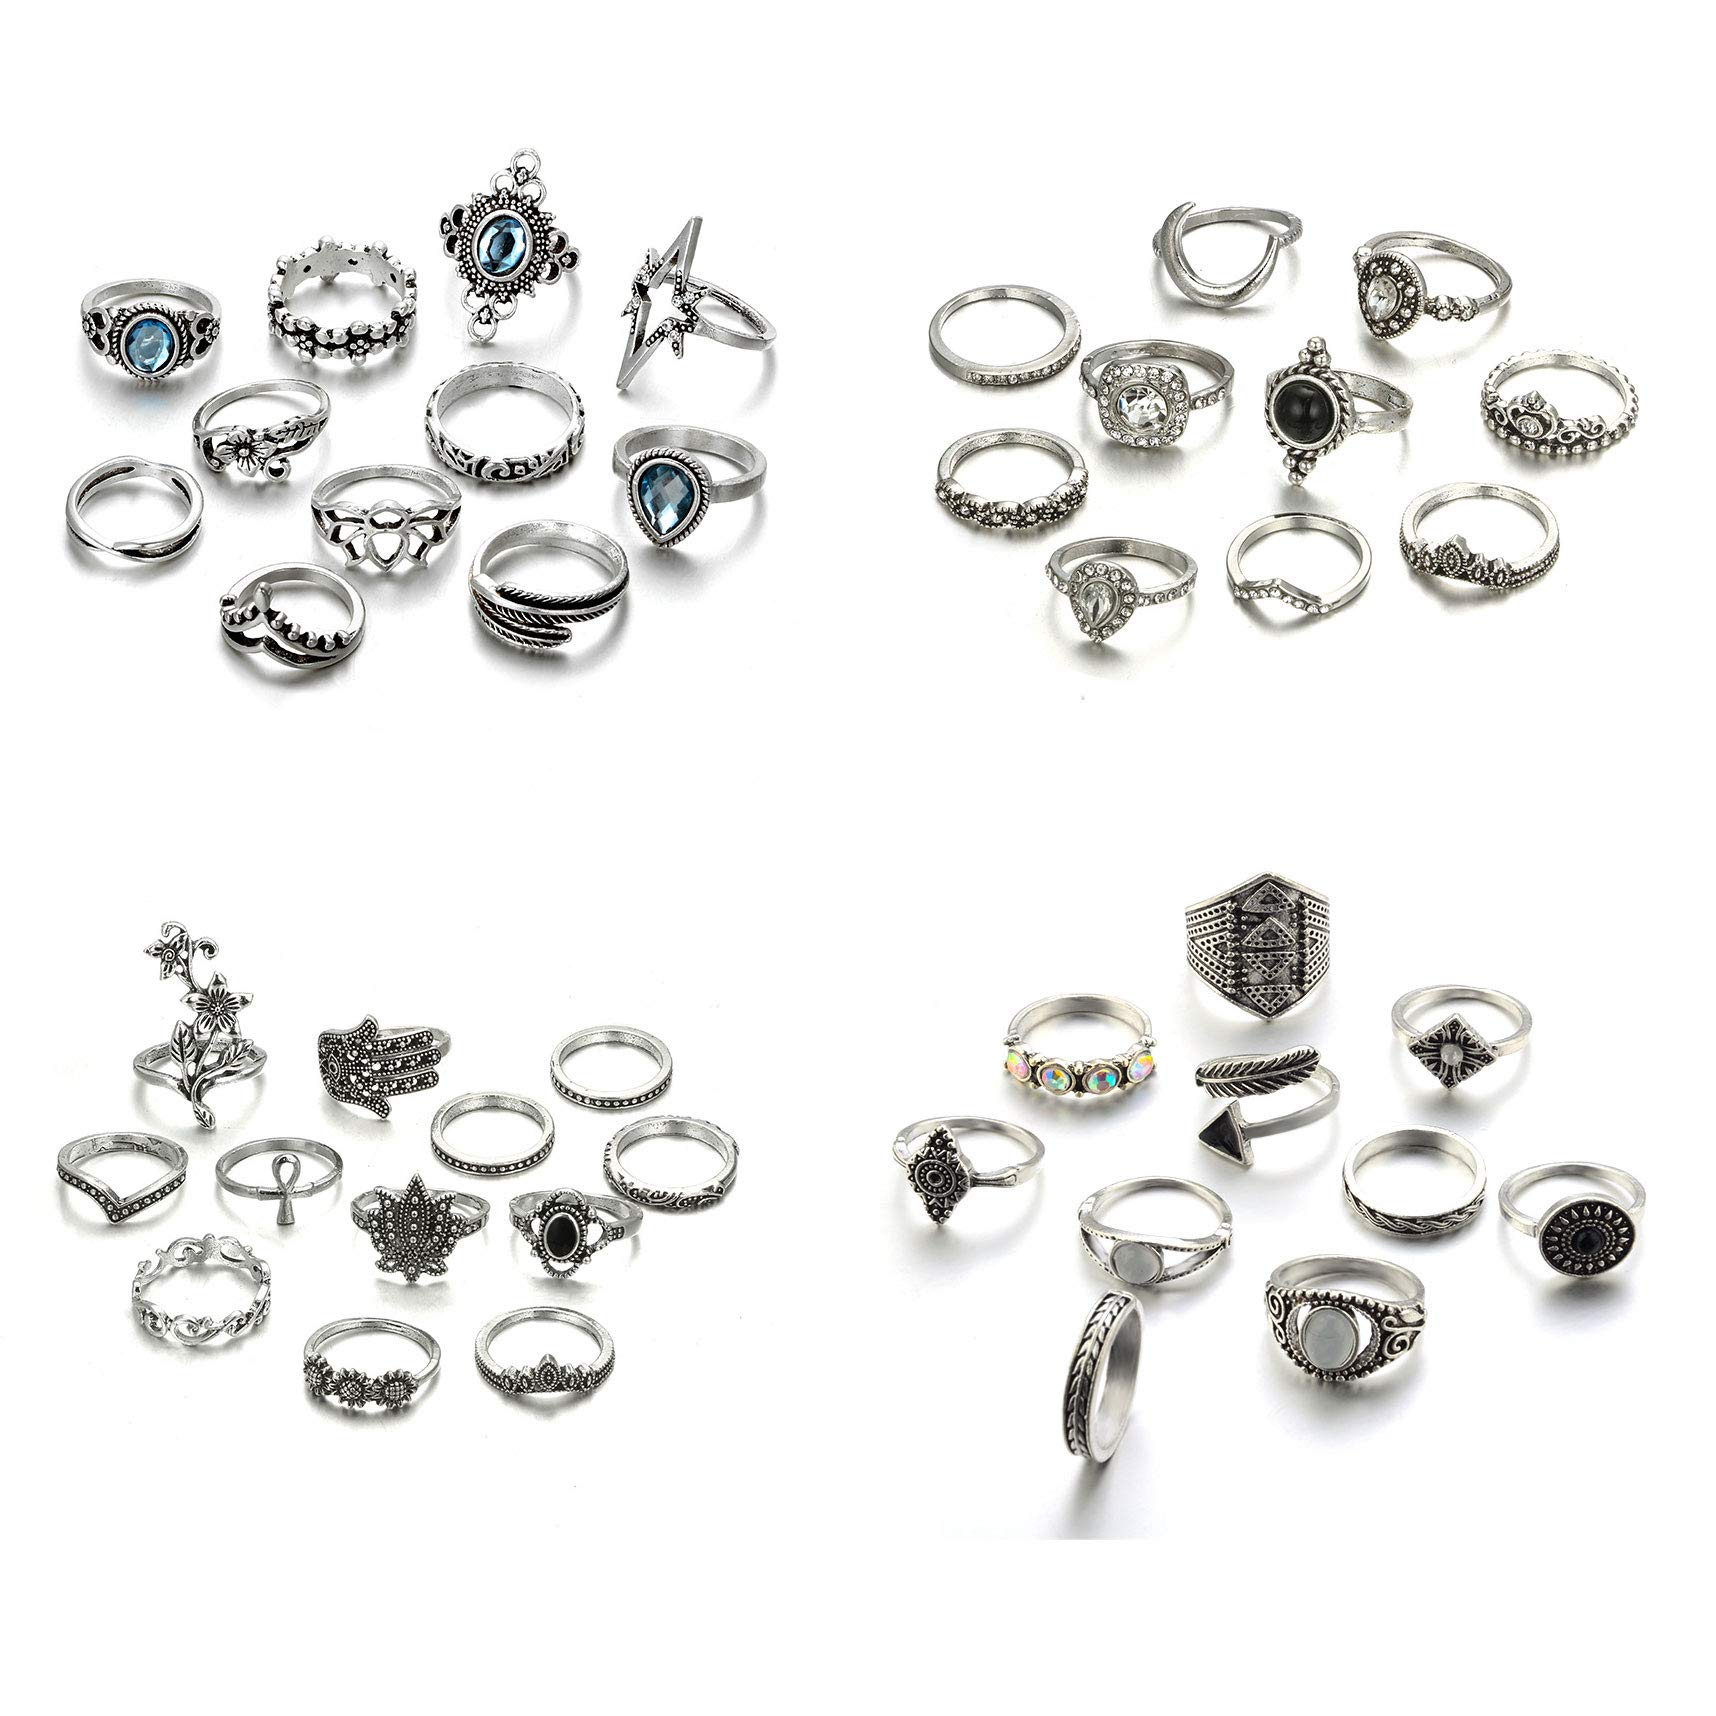 Gudukt 43PCS Vintage Knuckle Rings Set Bohemian Stacking Rings for Women Fashion Midi Finger Ring by Zealmer